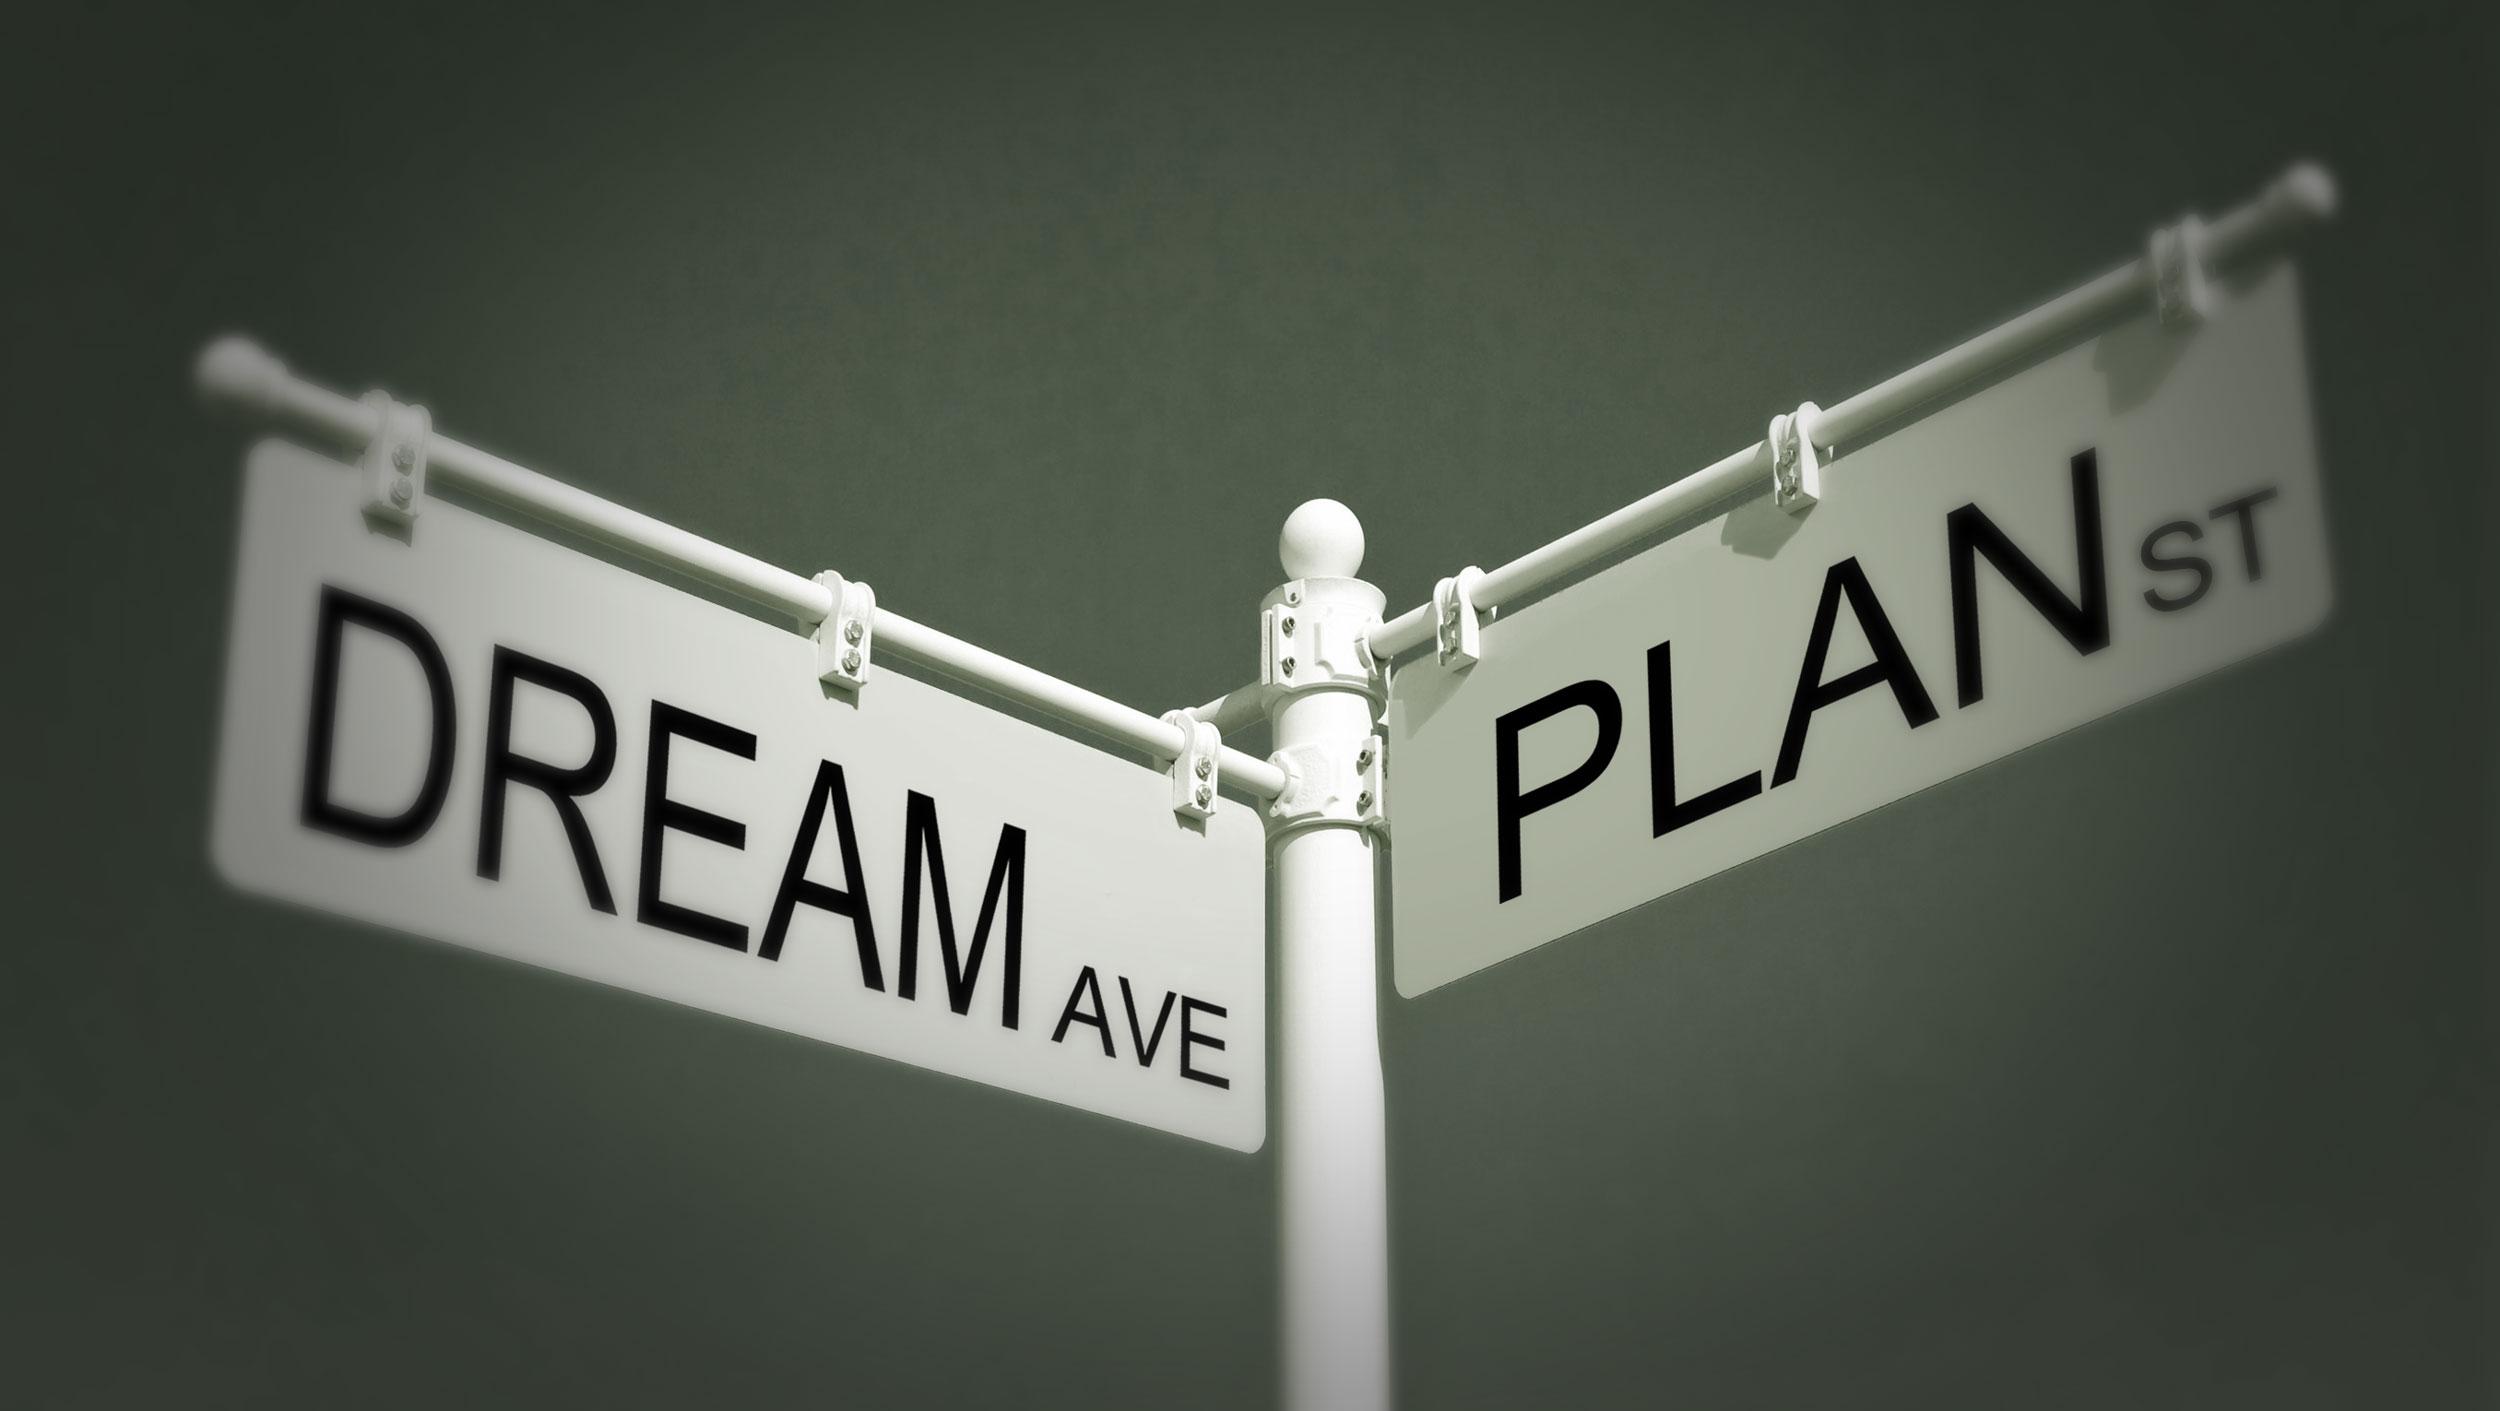 dream_plan